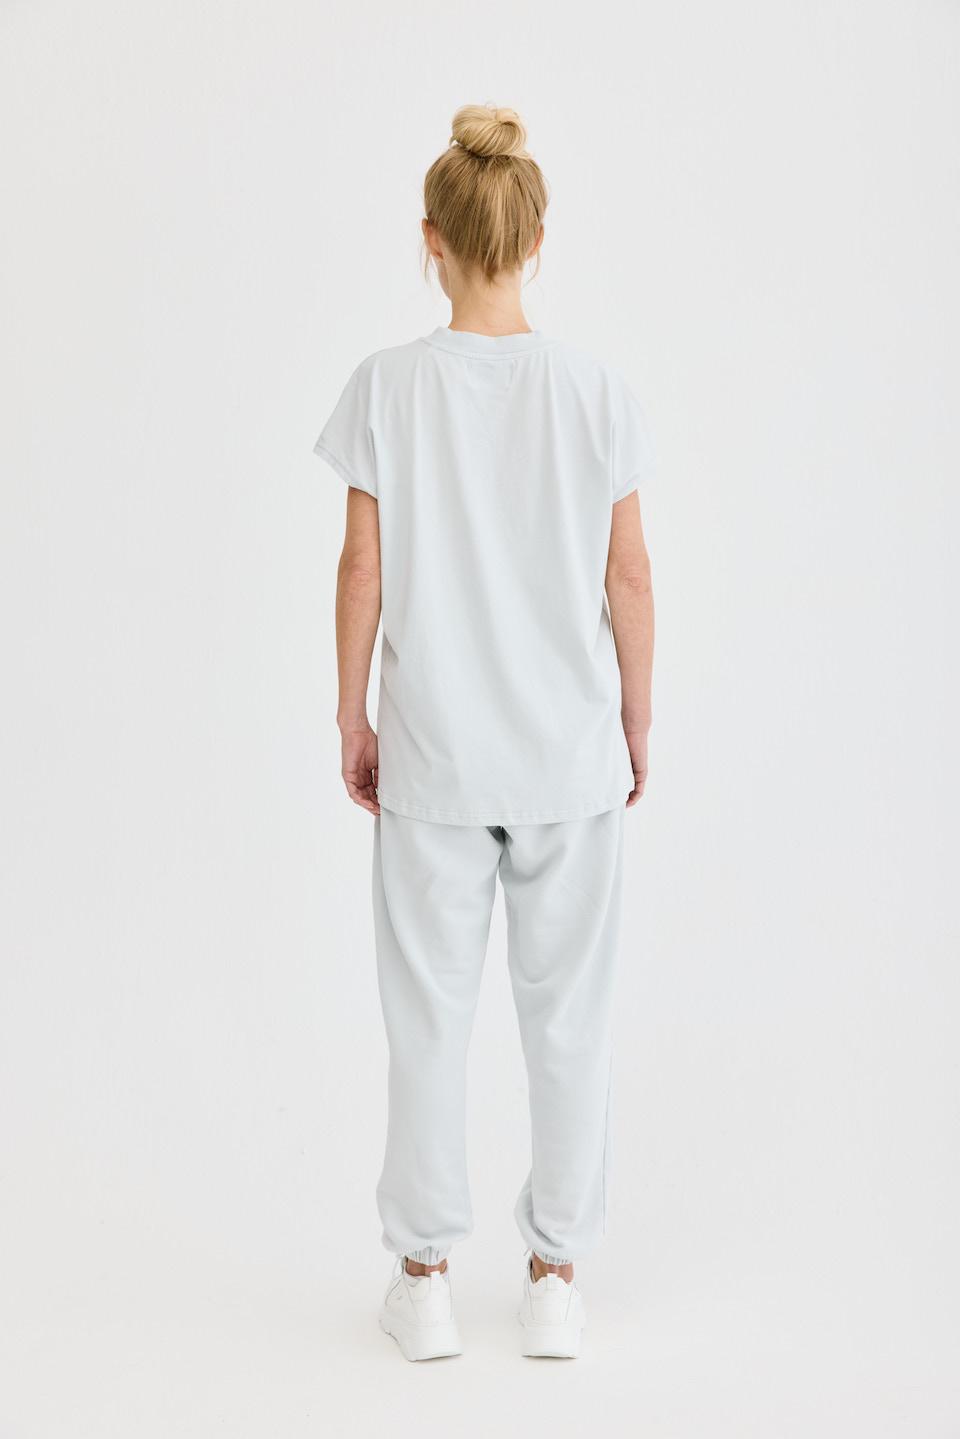 CPH Shirt 1 org. cotton light grey - alternative 1